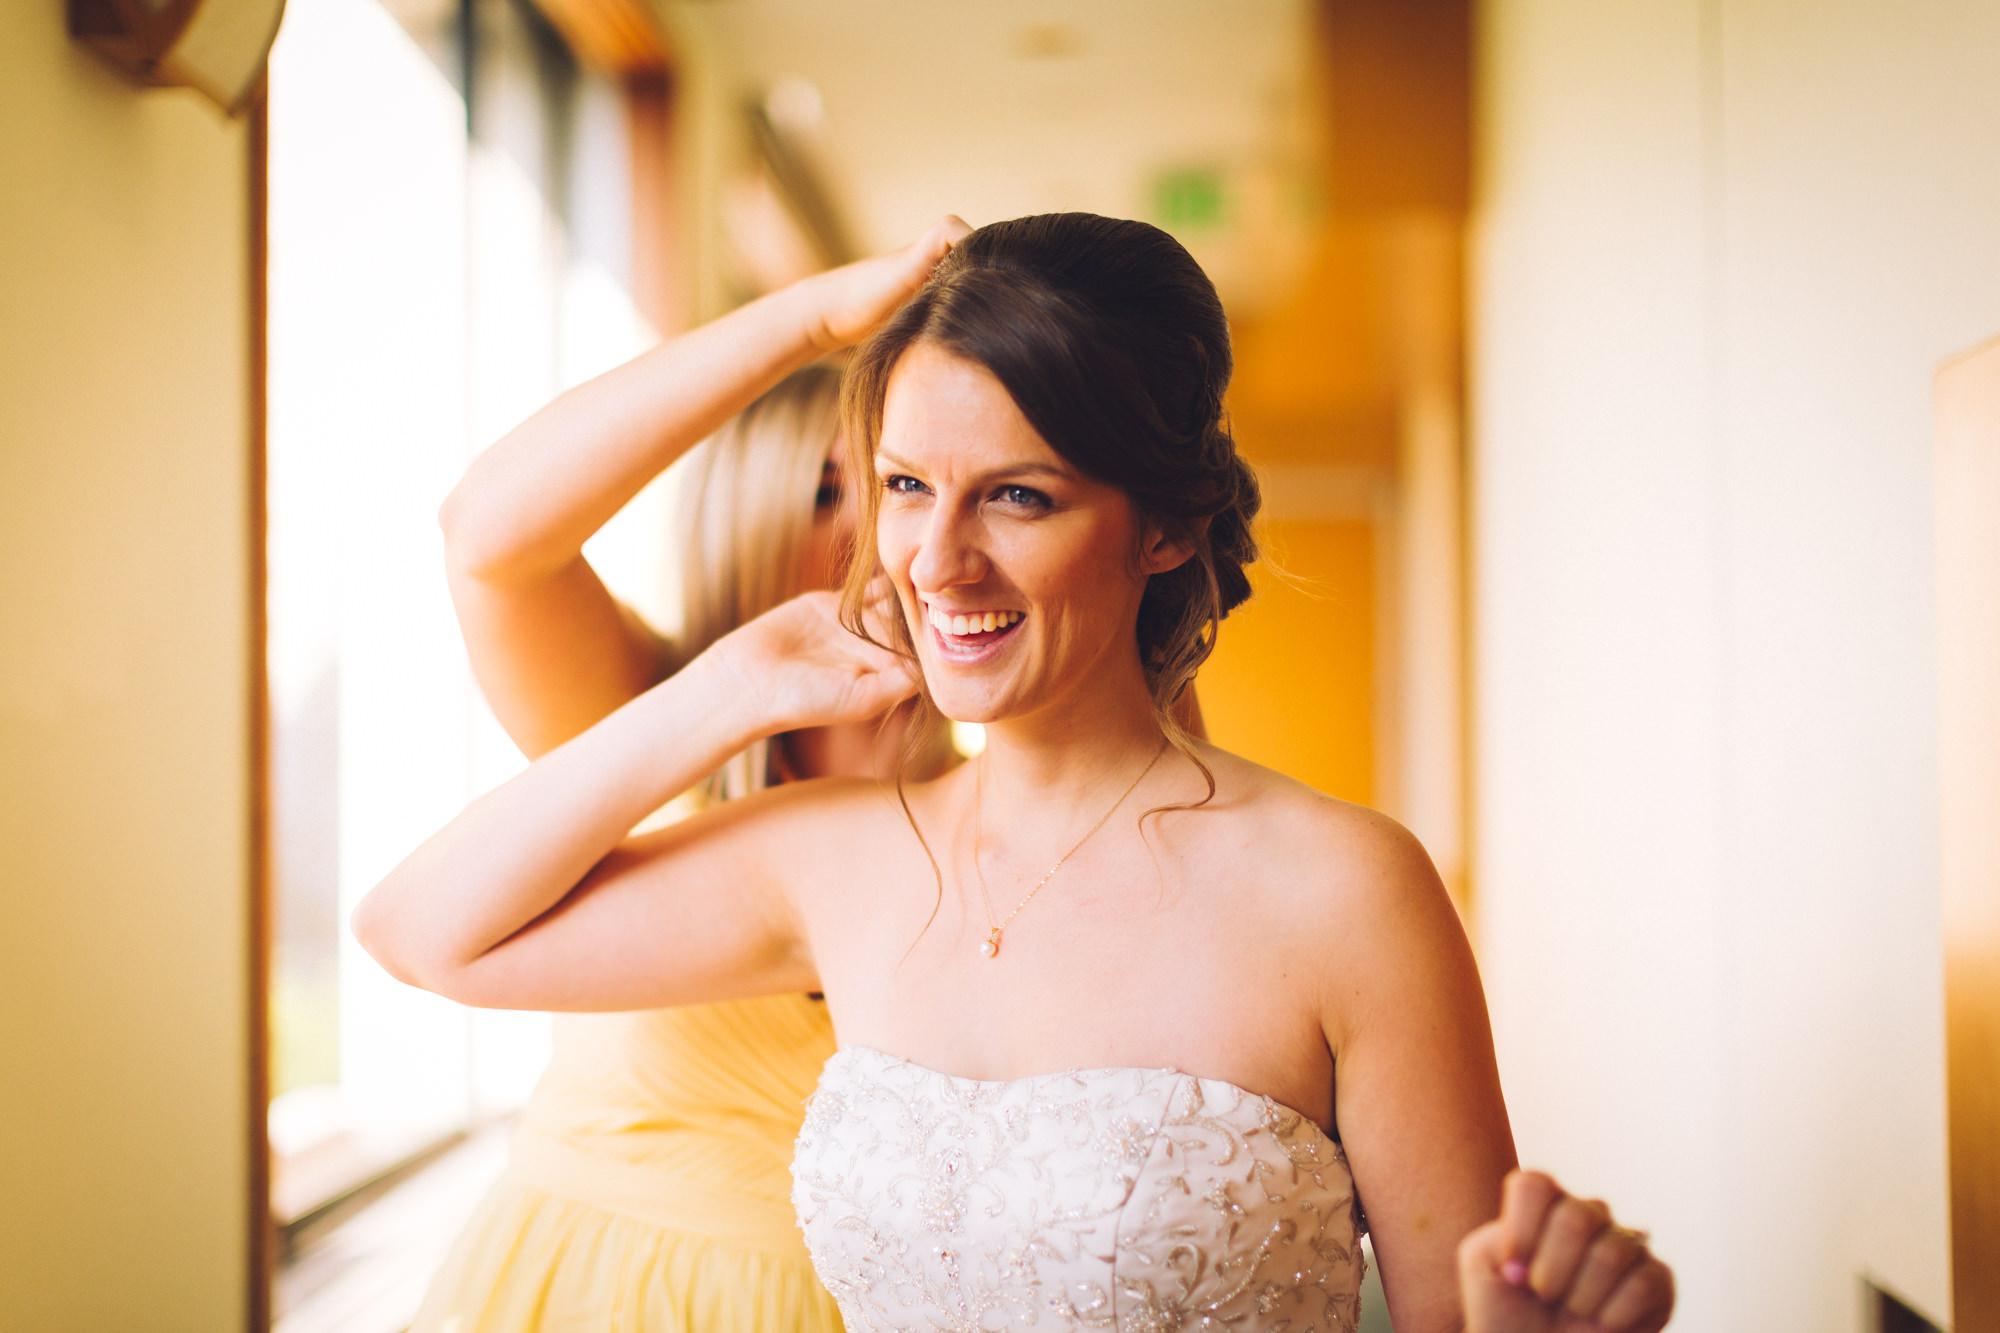 thelightandglass-wedding-engagement-photography-031.jpg